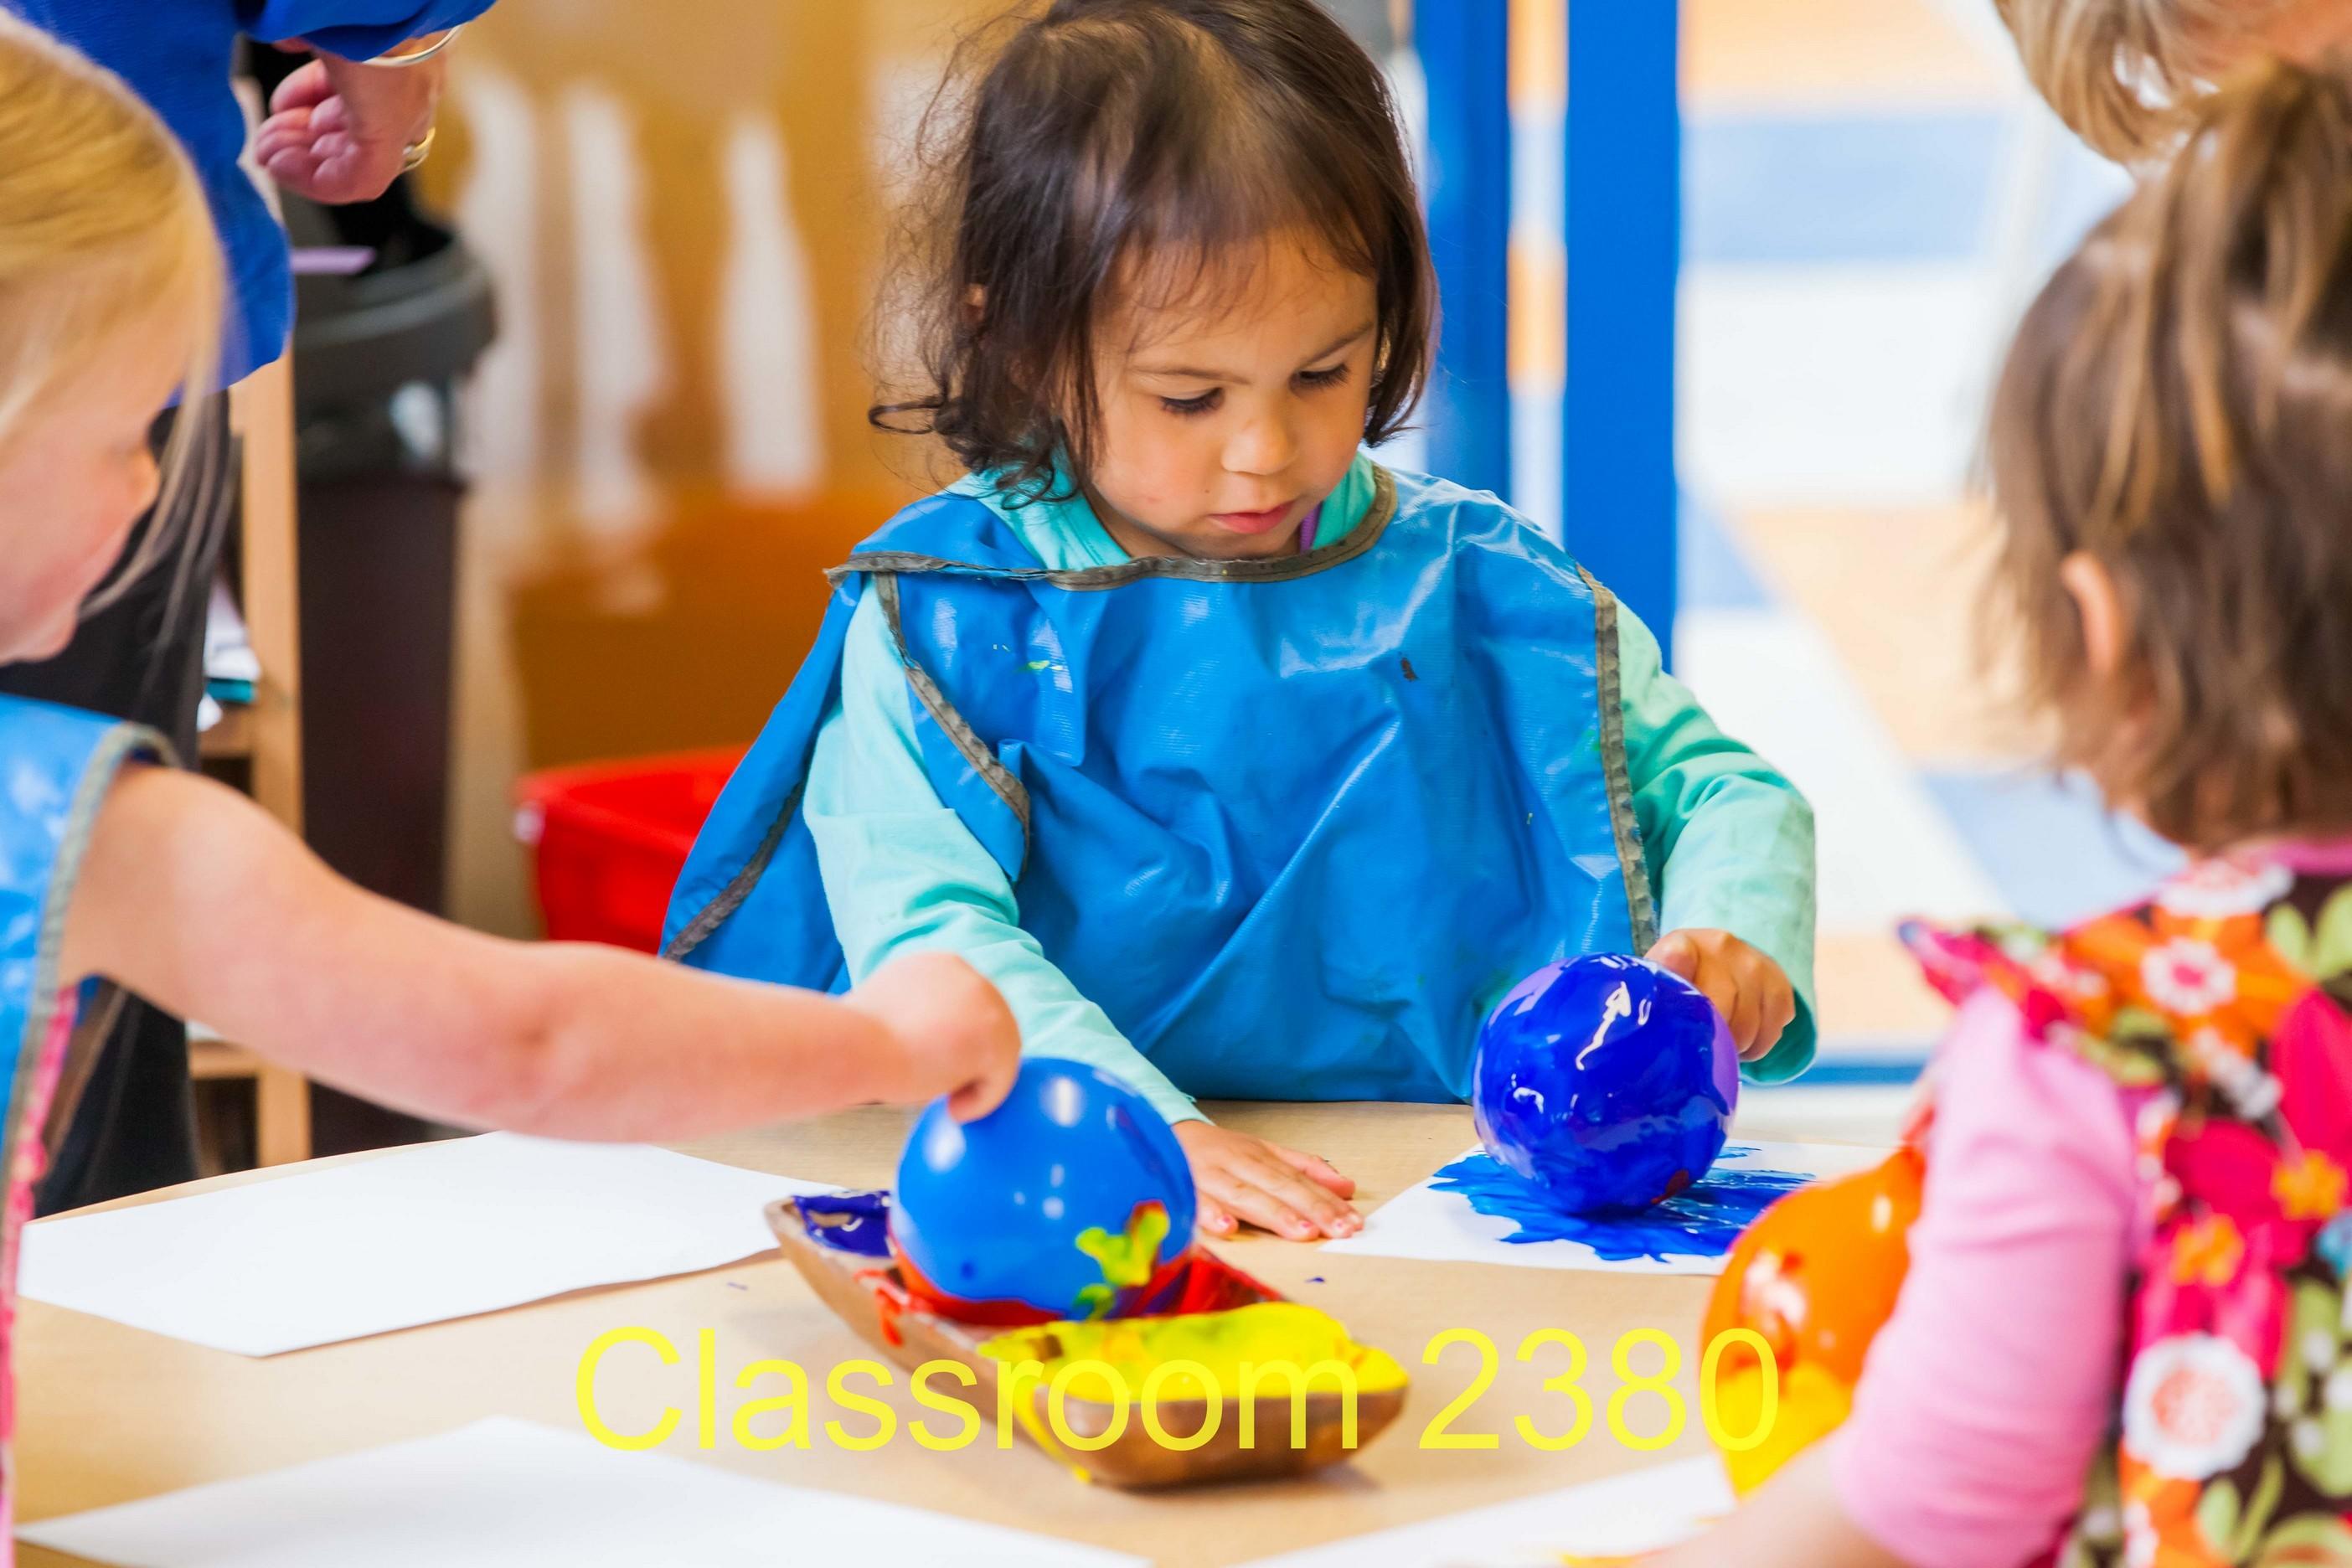 Classroom 2380